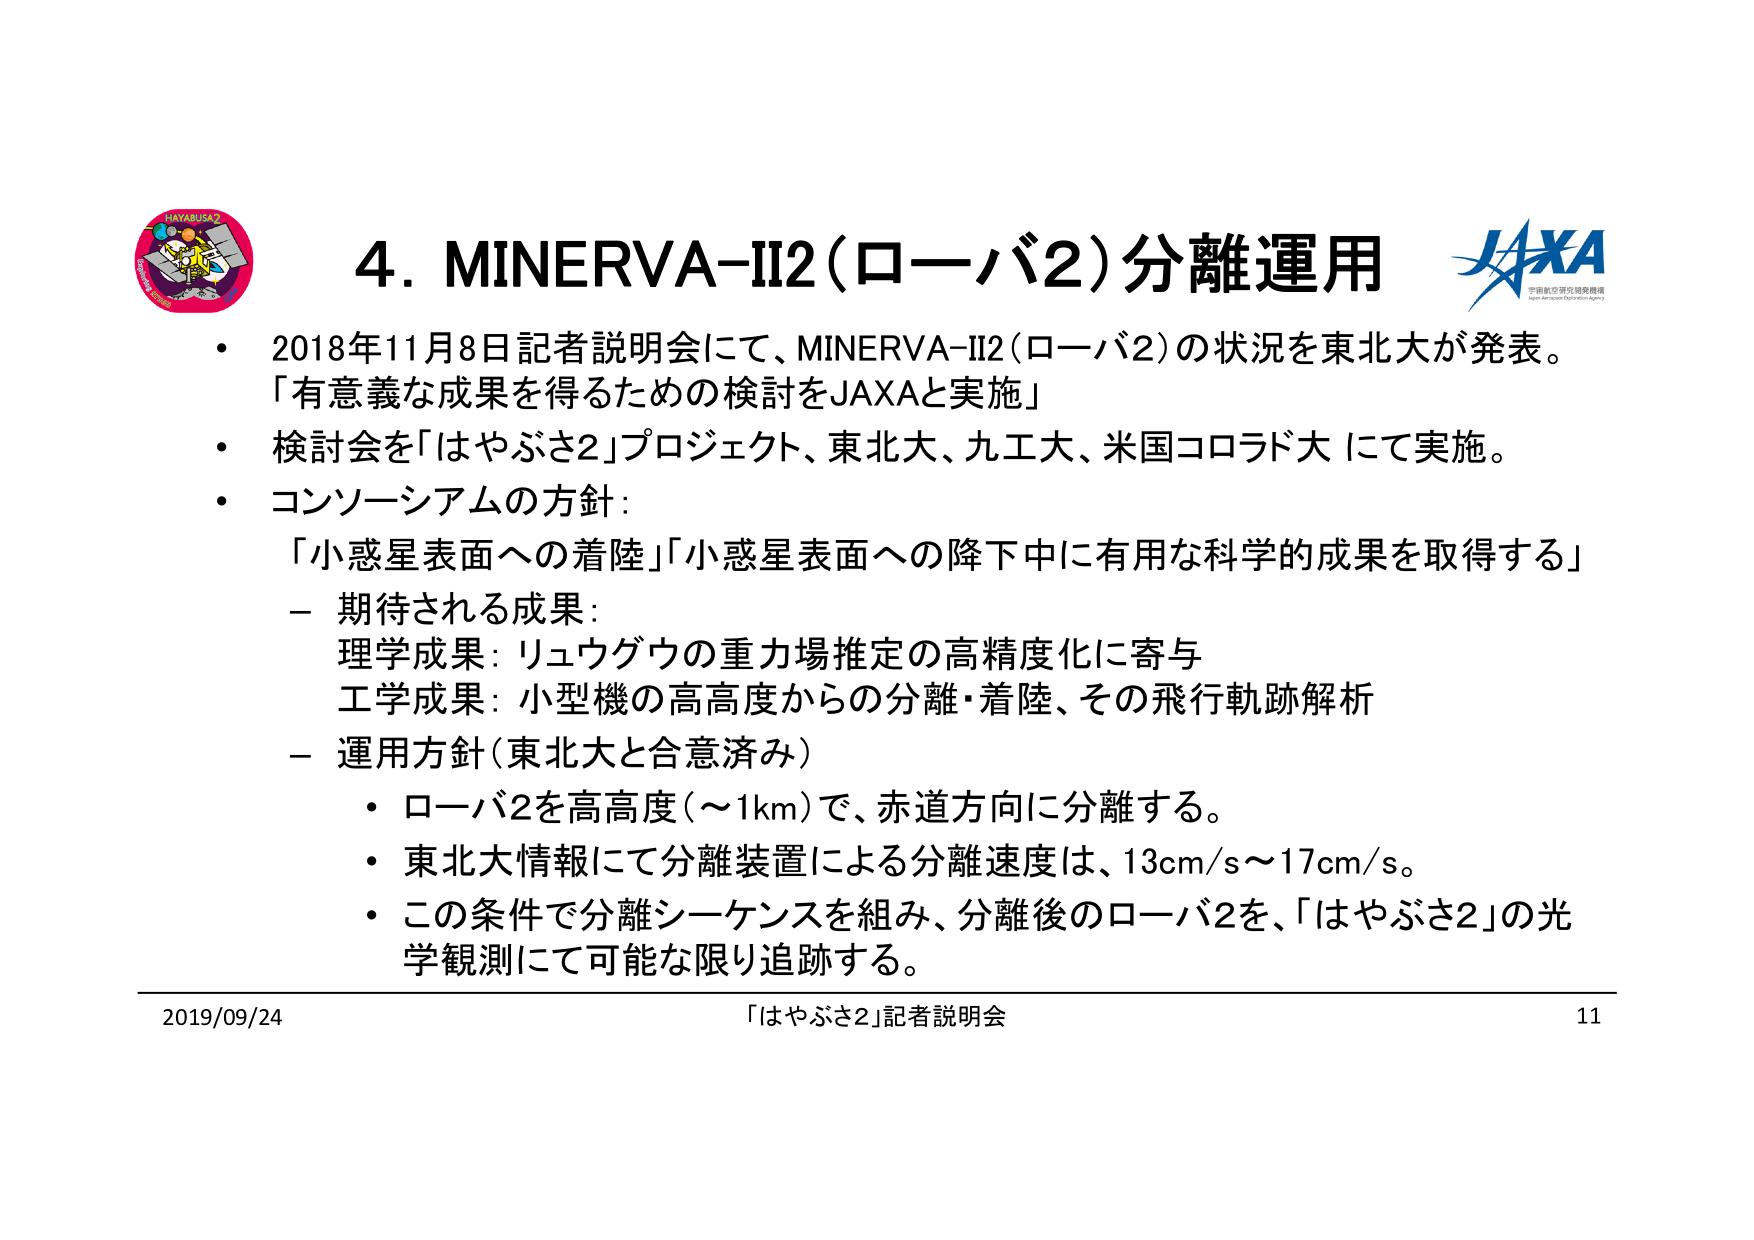 f:id:Imamura:20190924122535p:plain